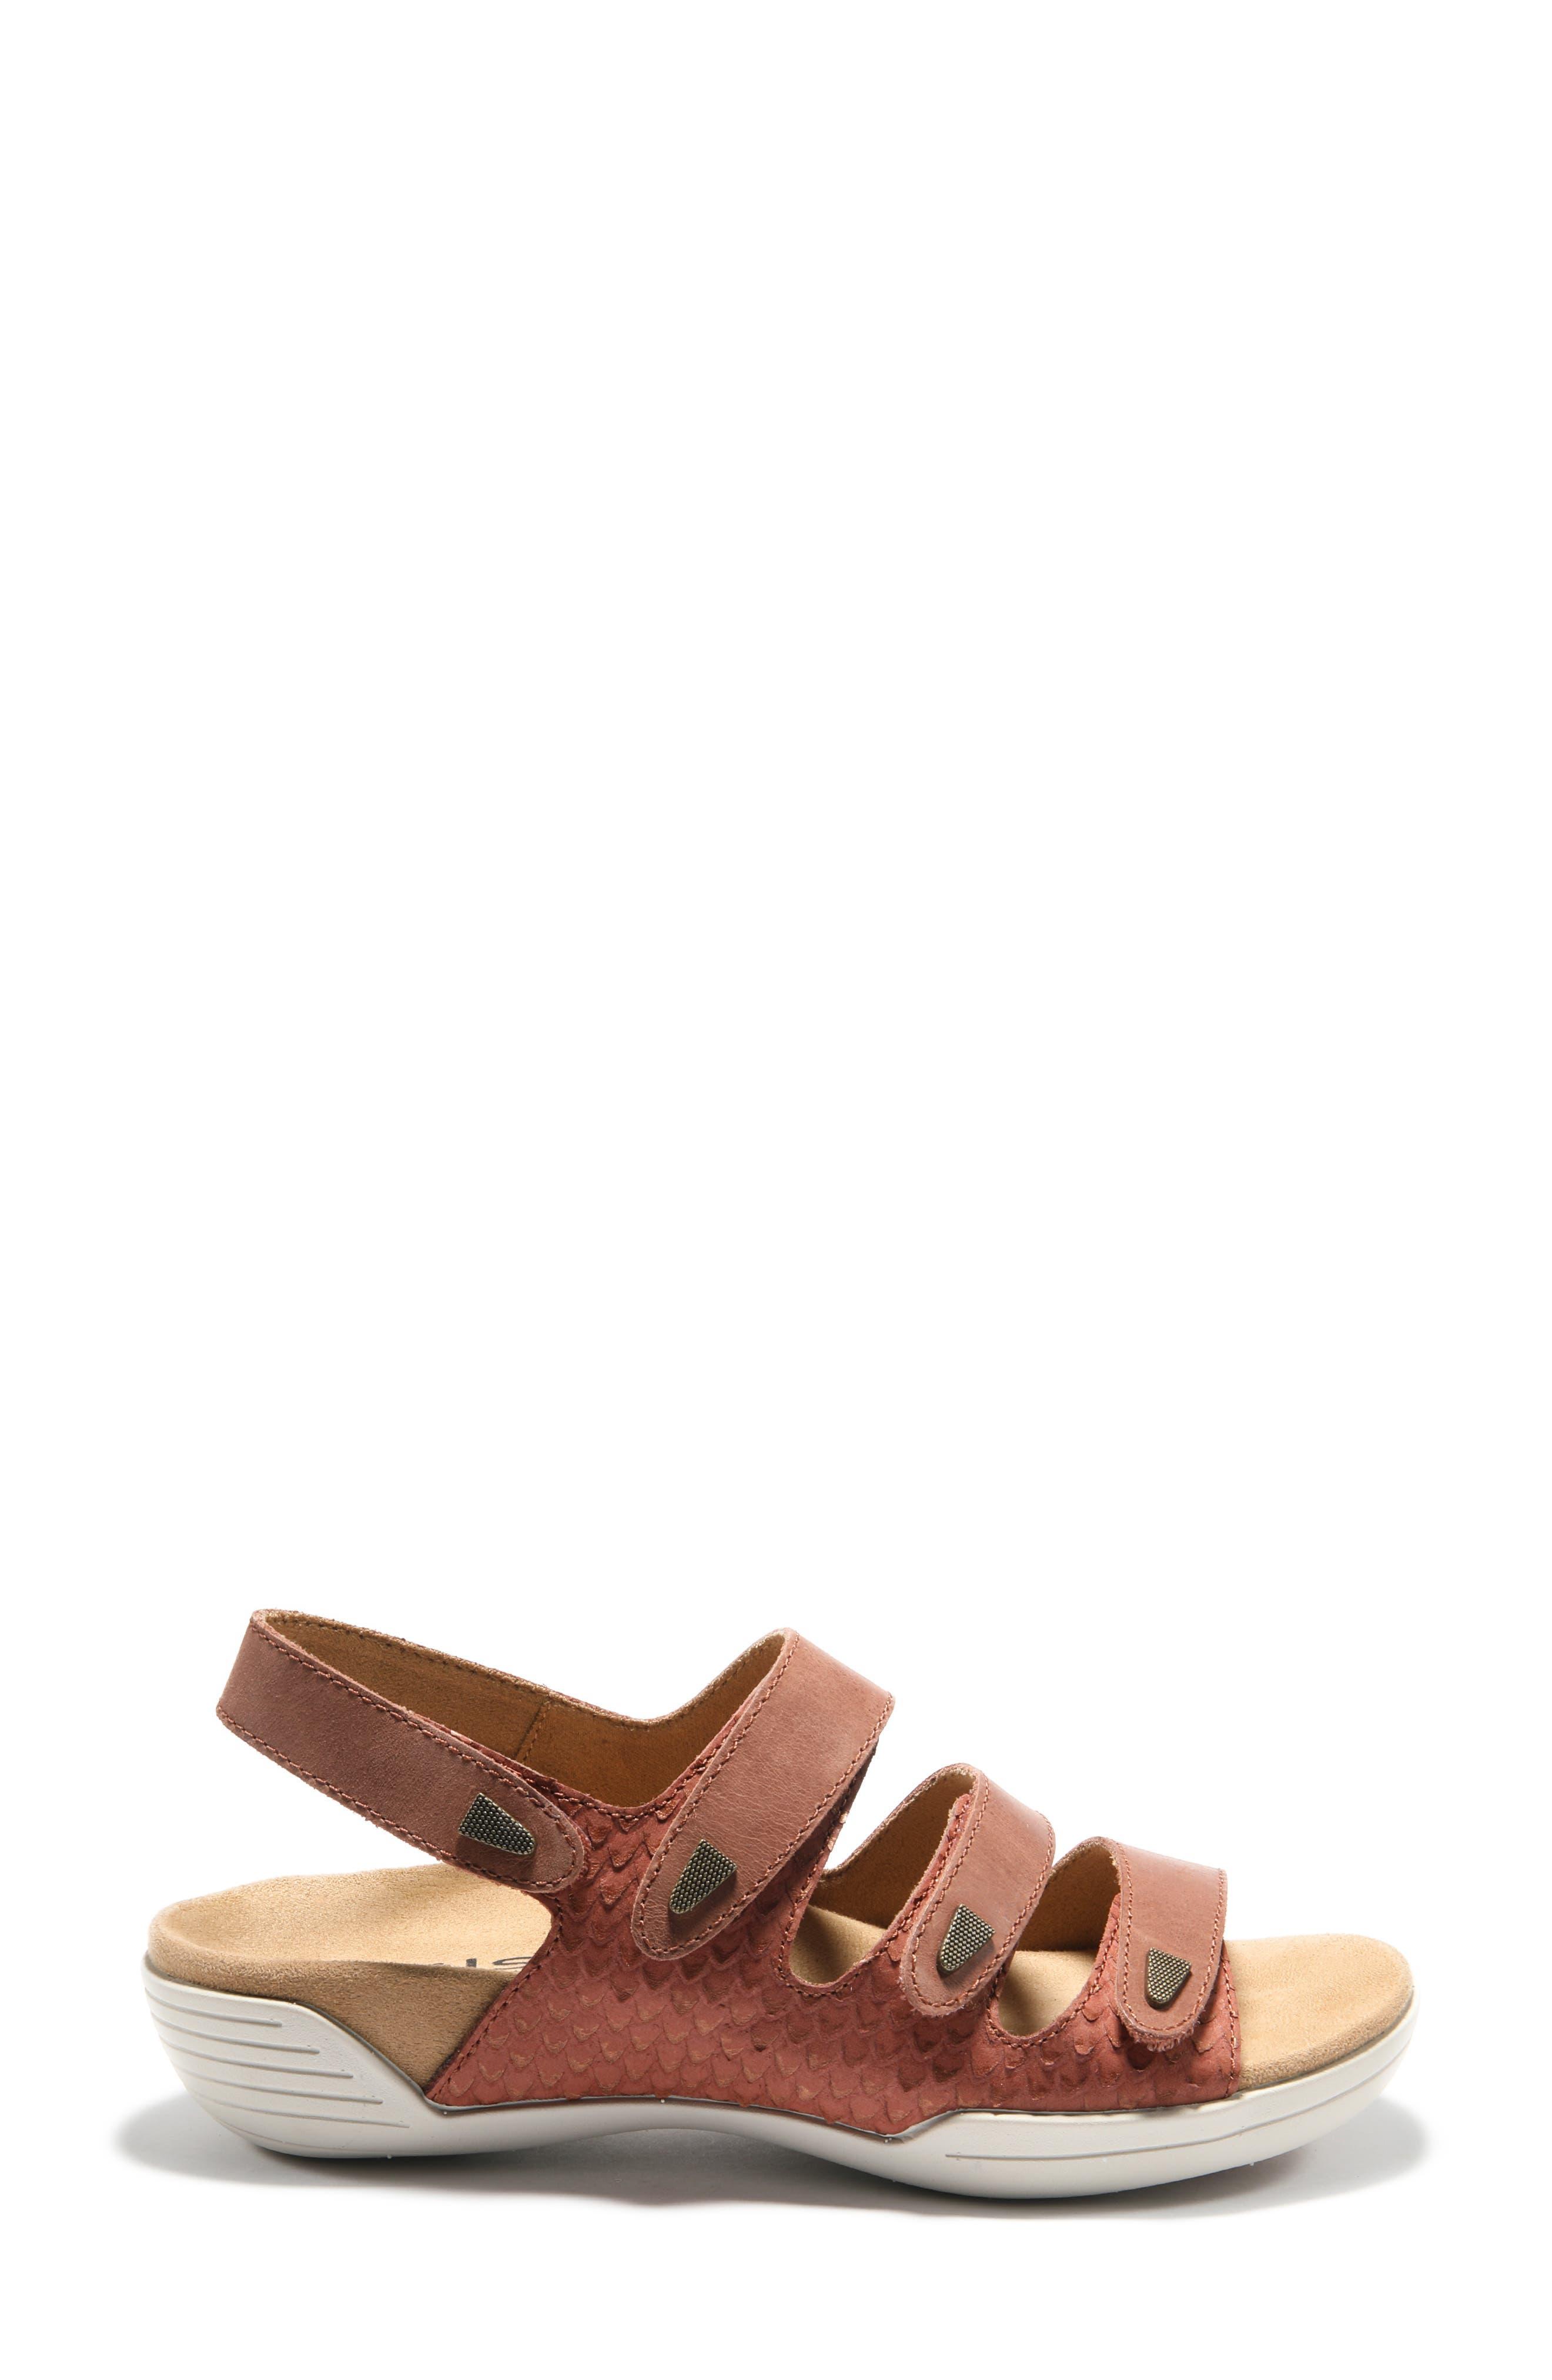 Halsa Footwear Demaris Slingback Sandal